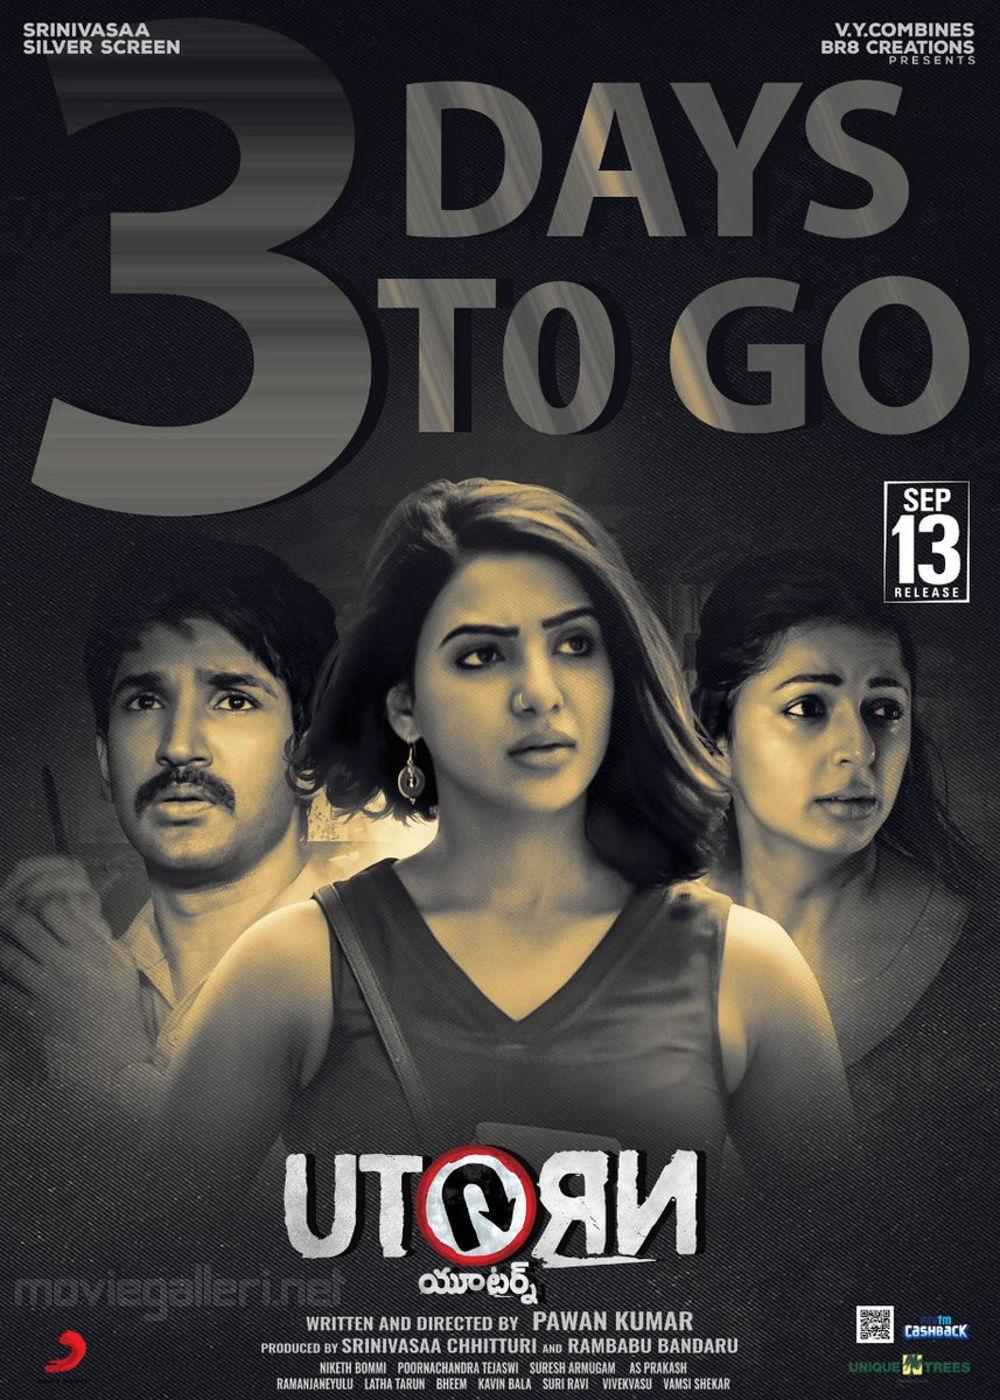 Aadhi Samantha Bhumika U Turn Movie 3 Days to Go Poster